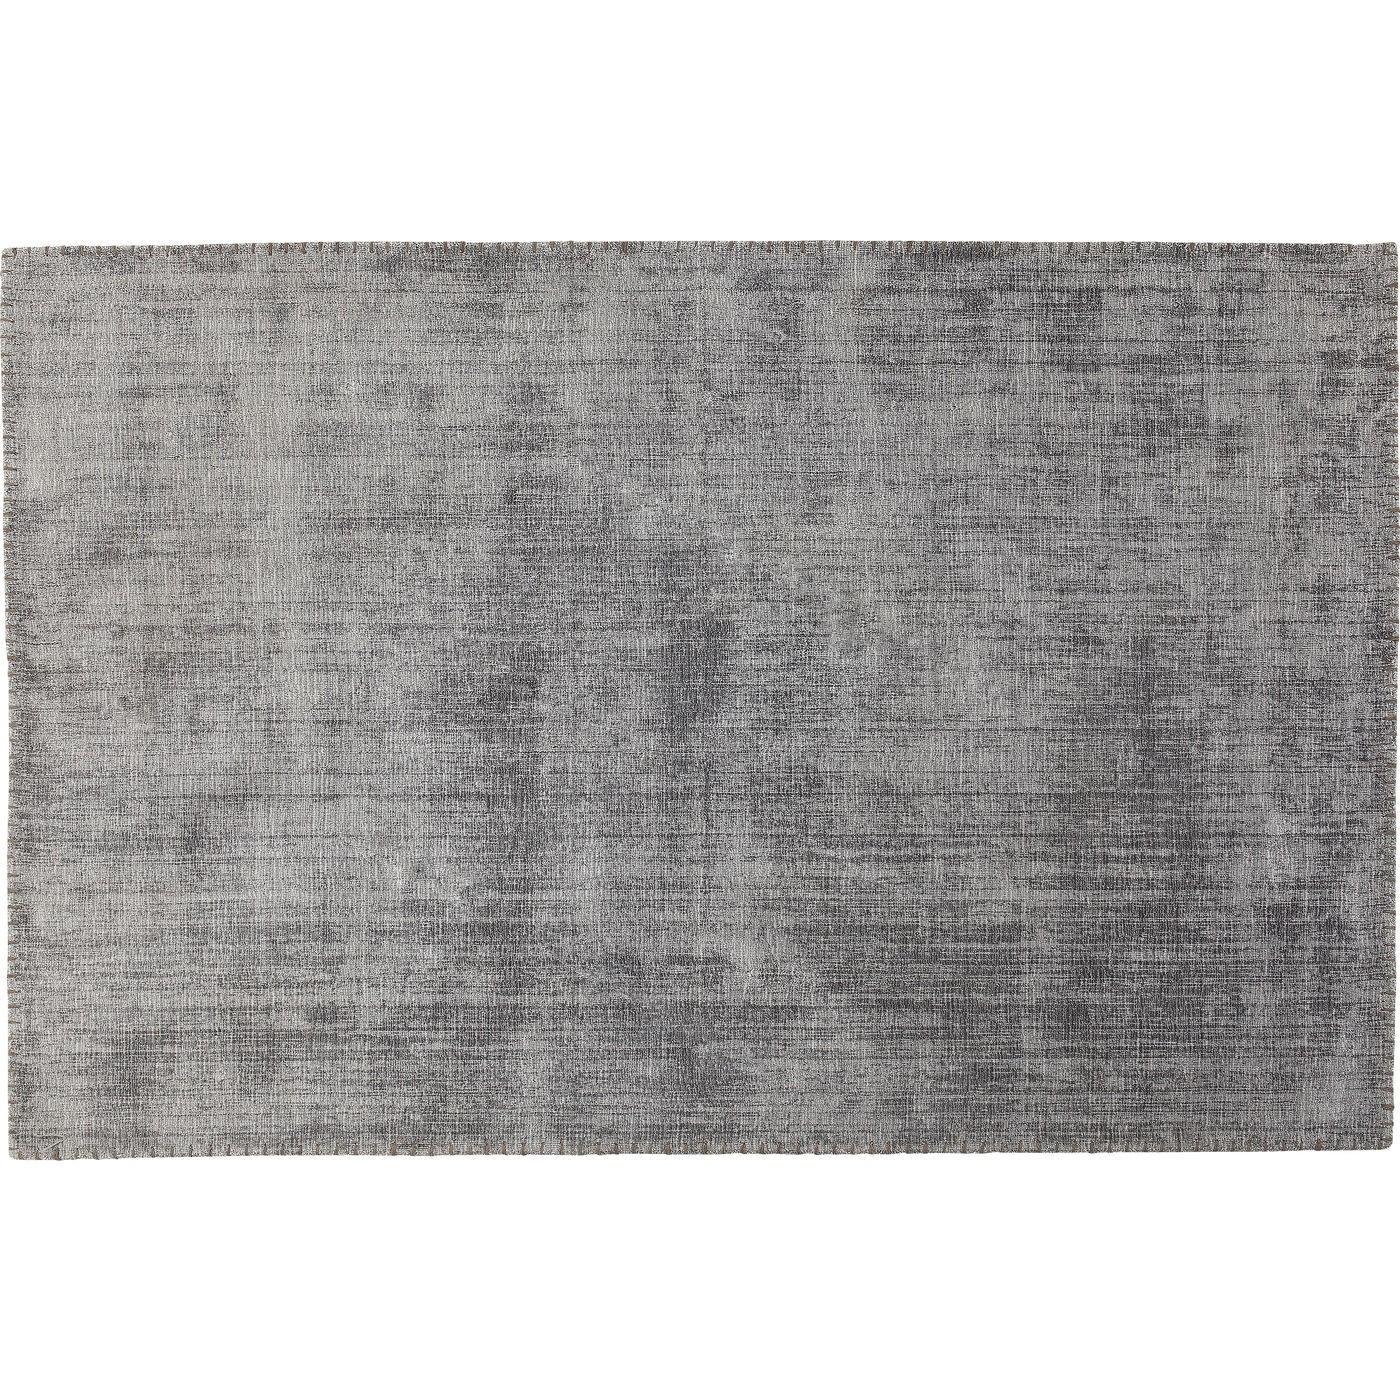 Image of   Tæppe Loom Stich Grå 170 x 240 cm